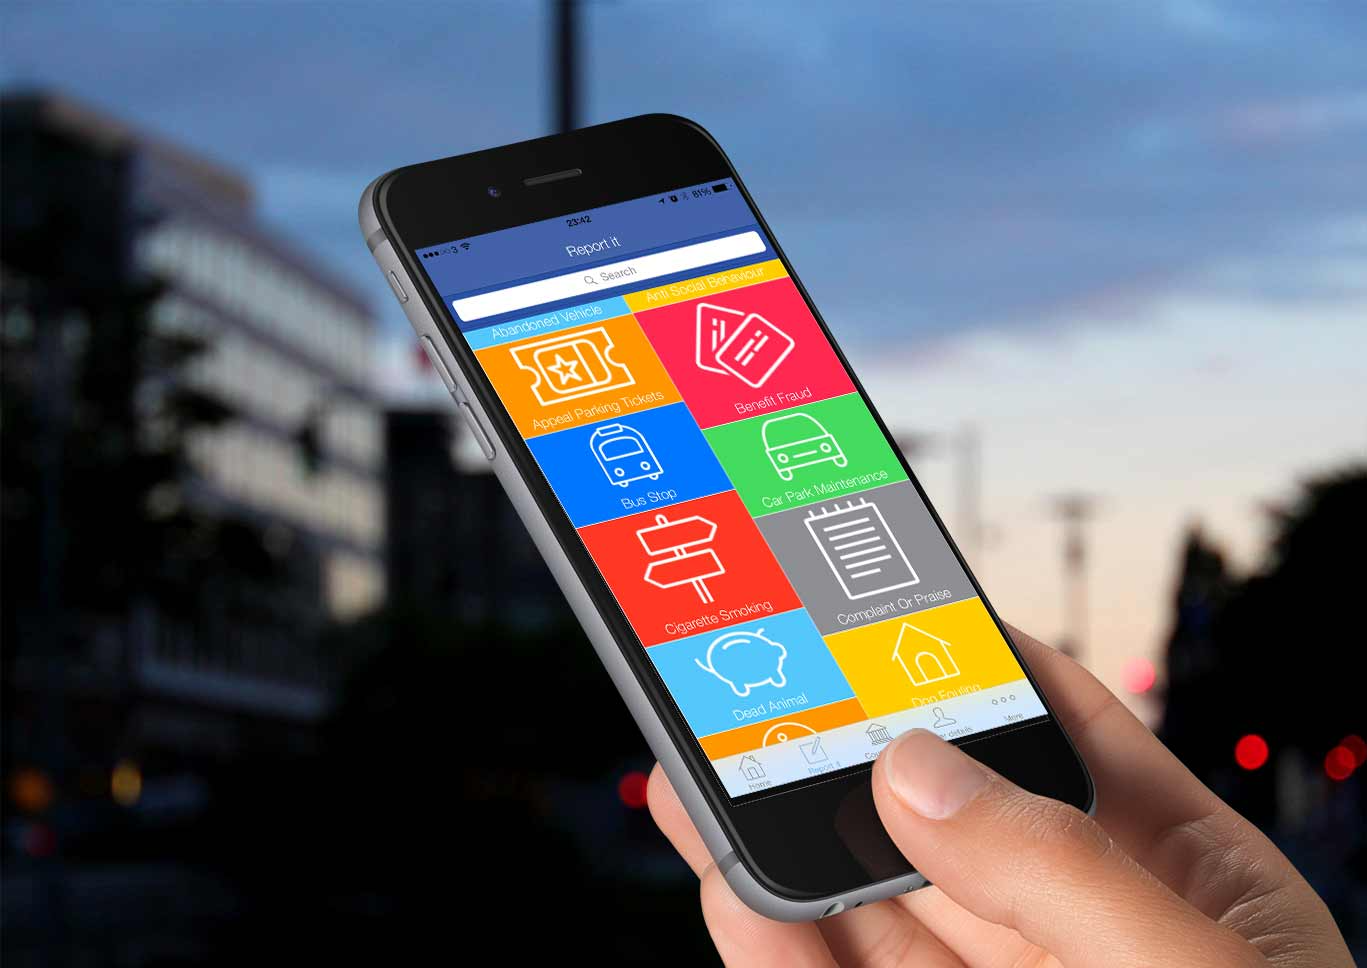 Mobile Worker screenshot: iphone-6-mockup-1